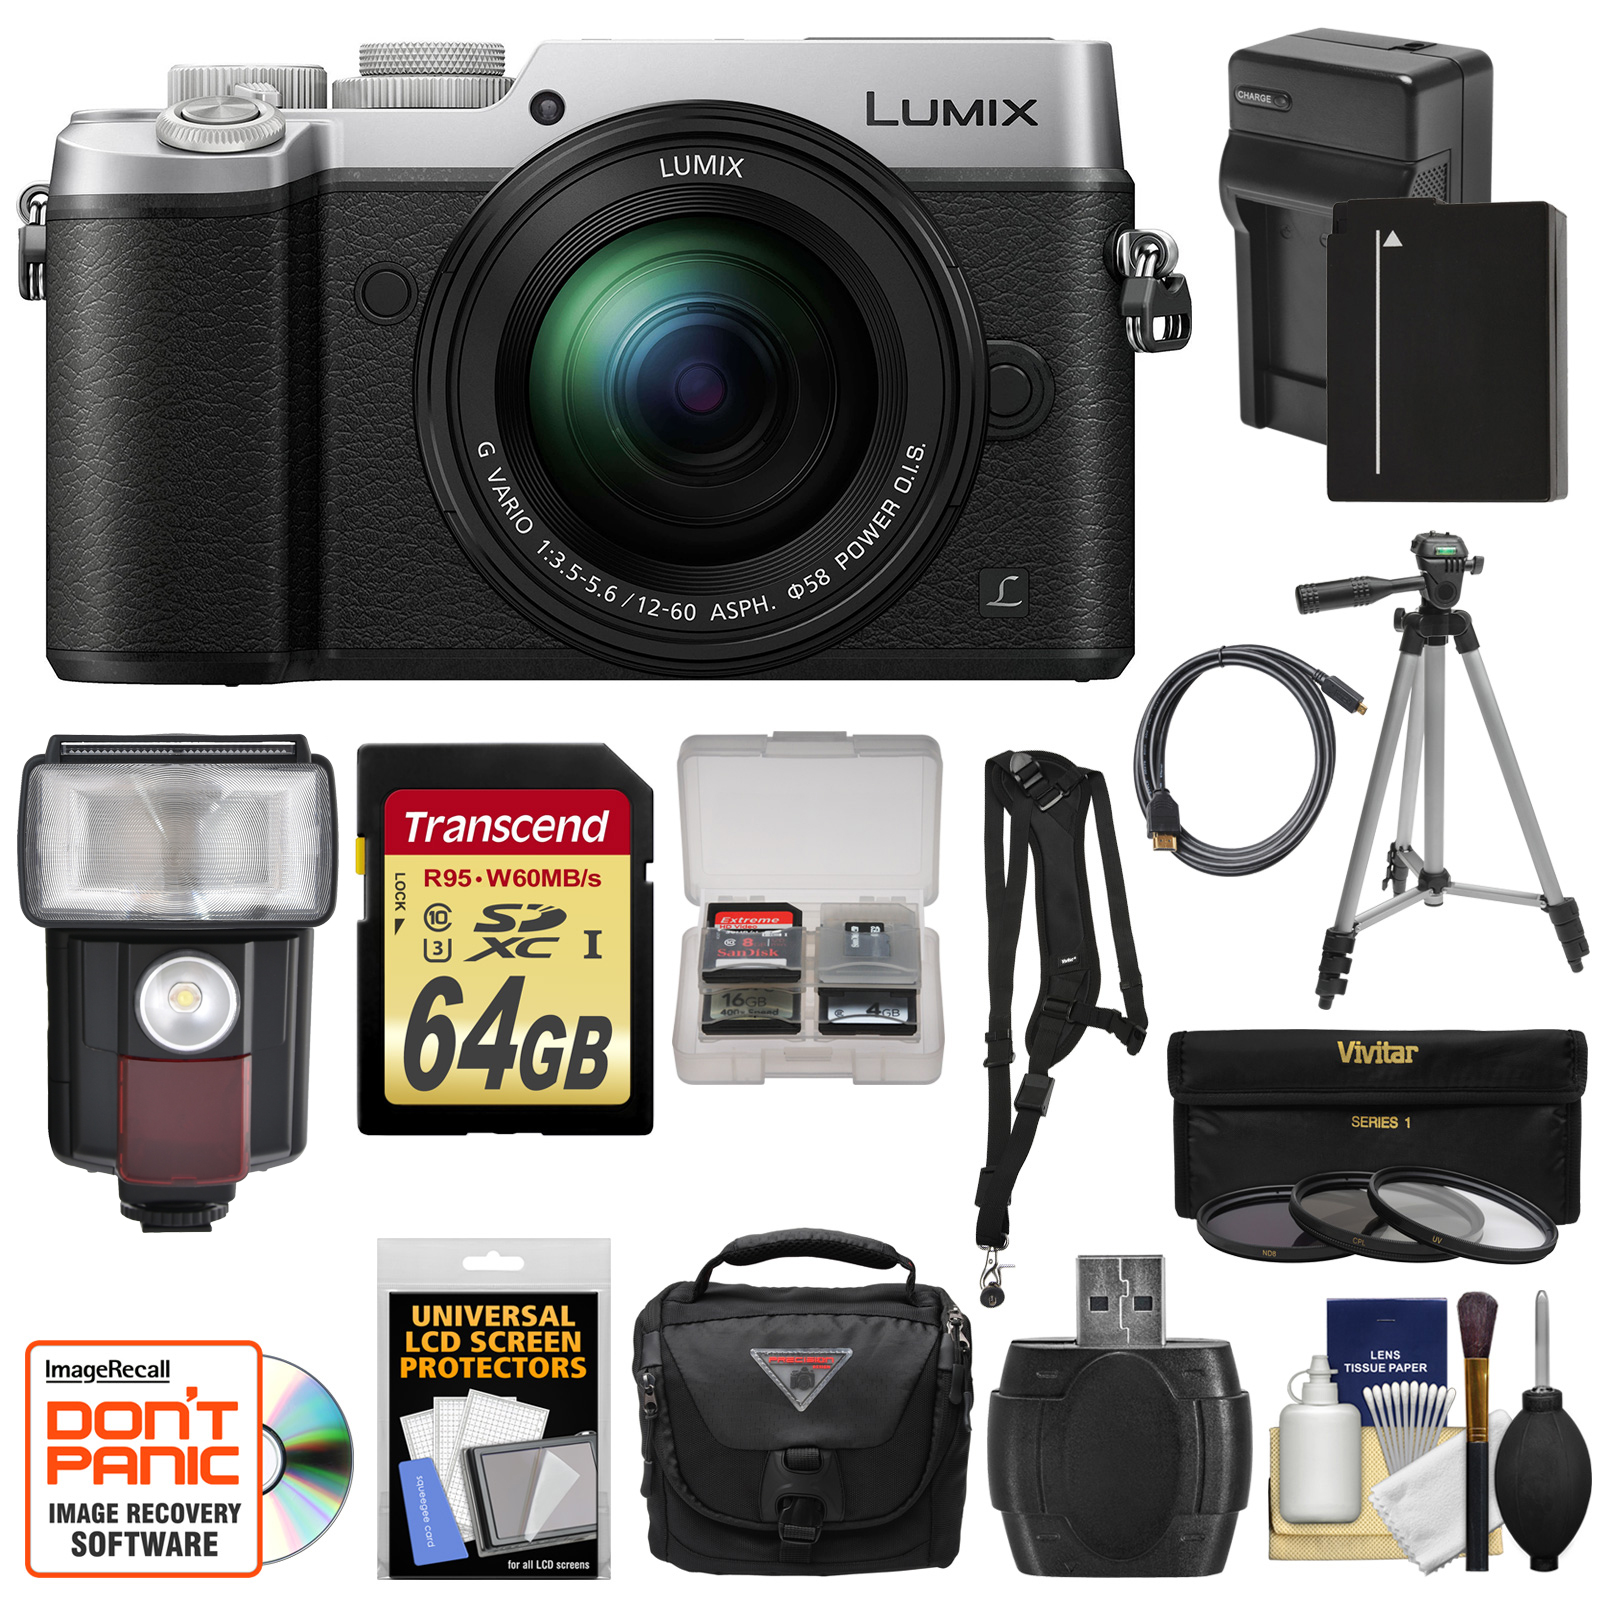 Panasonic Lumix DMC-GX8 4K Wi-Fi Digital Camera Body (Black) with 12-60mm Lens + 64GB Card + Battery & Charger... by Panasonic